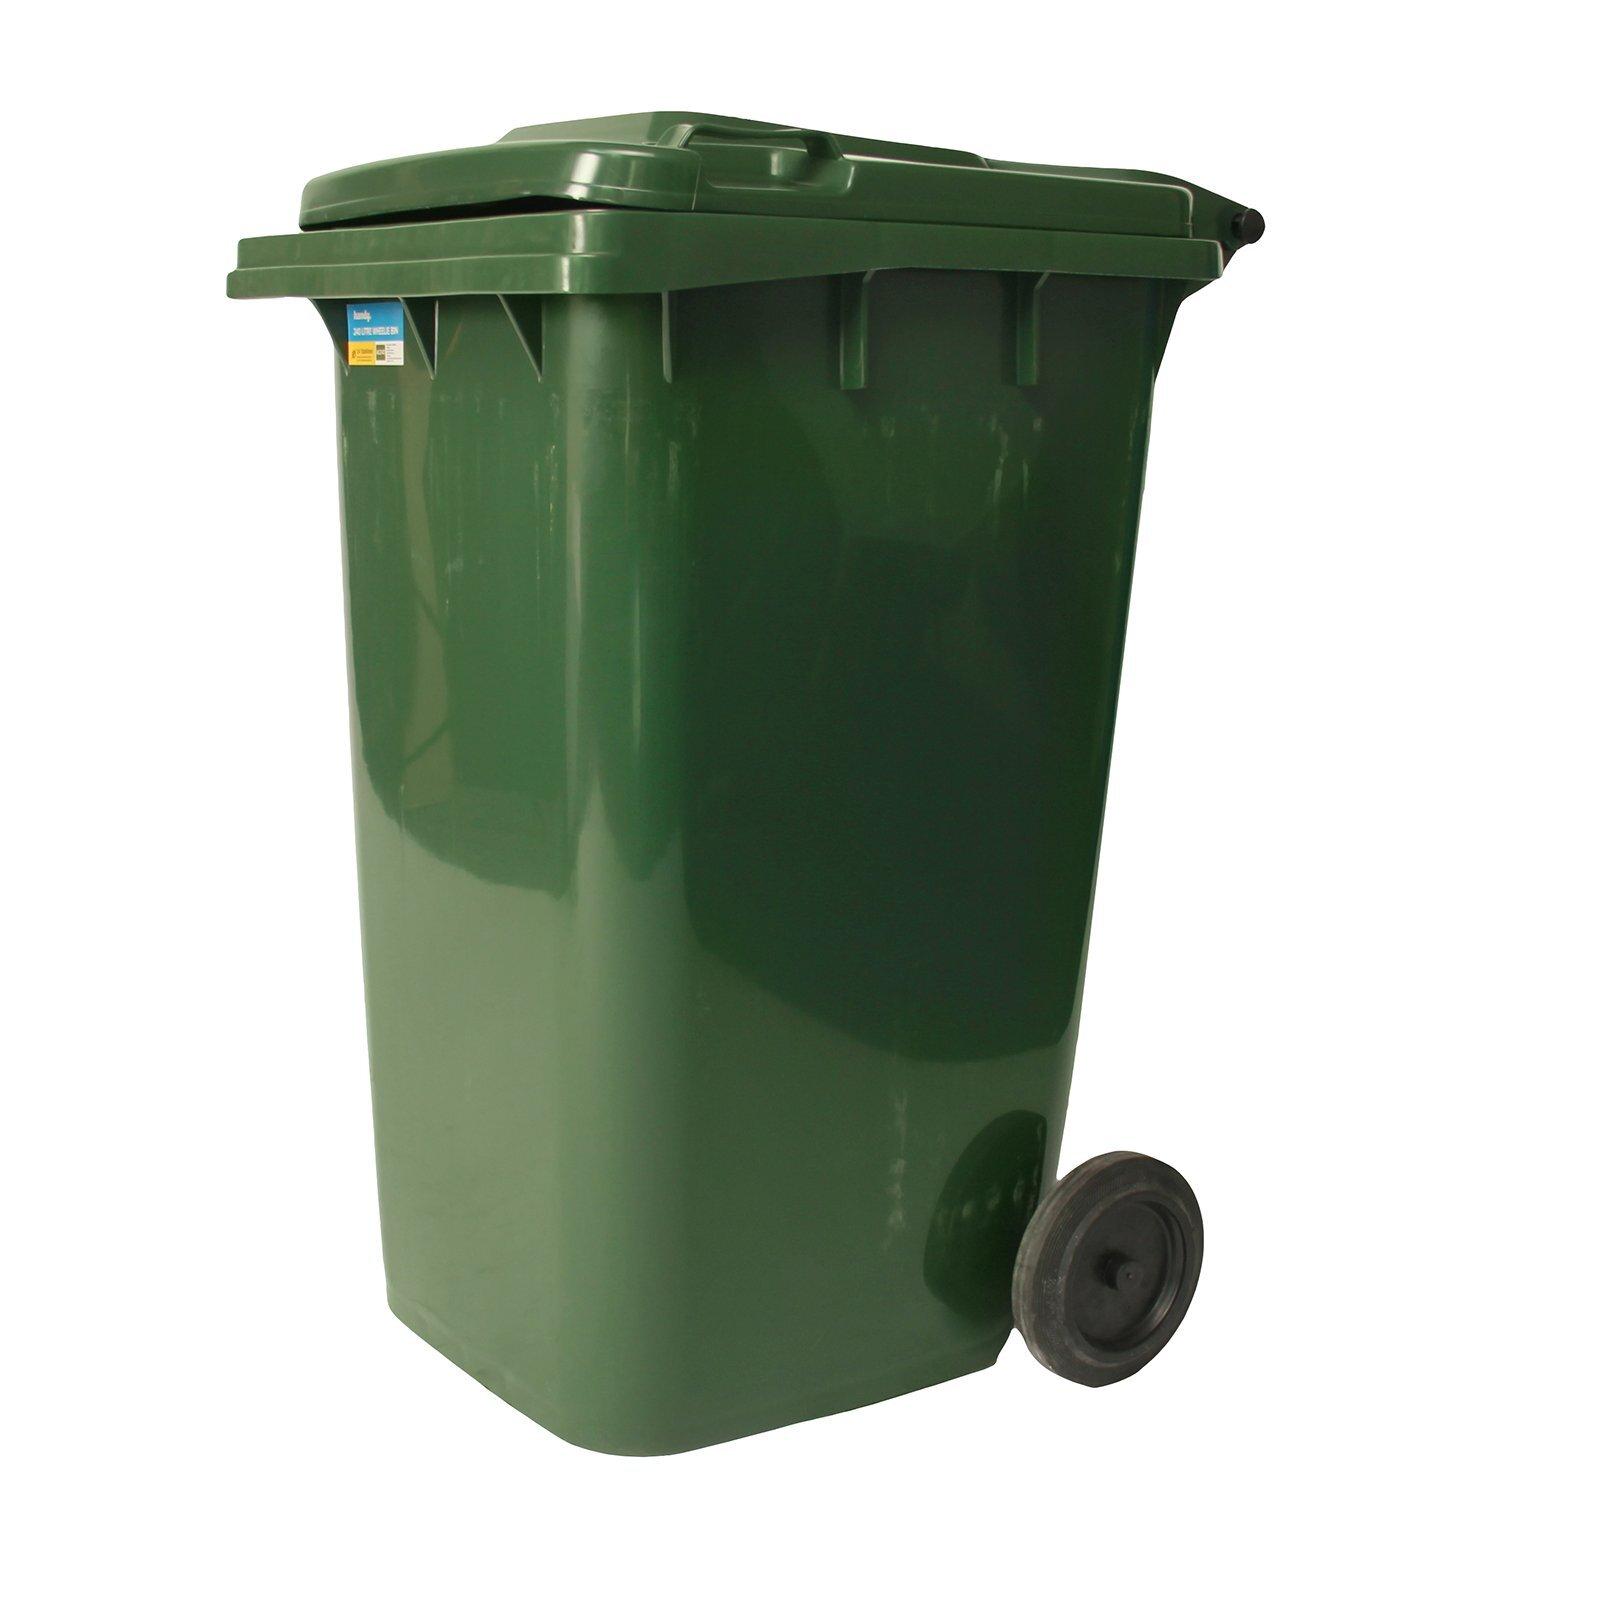 Handy 240L Green Wheelie Bin